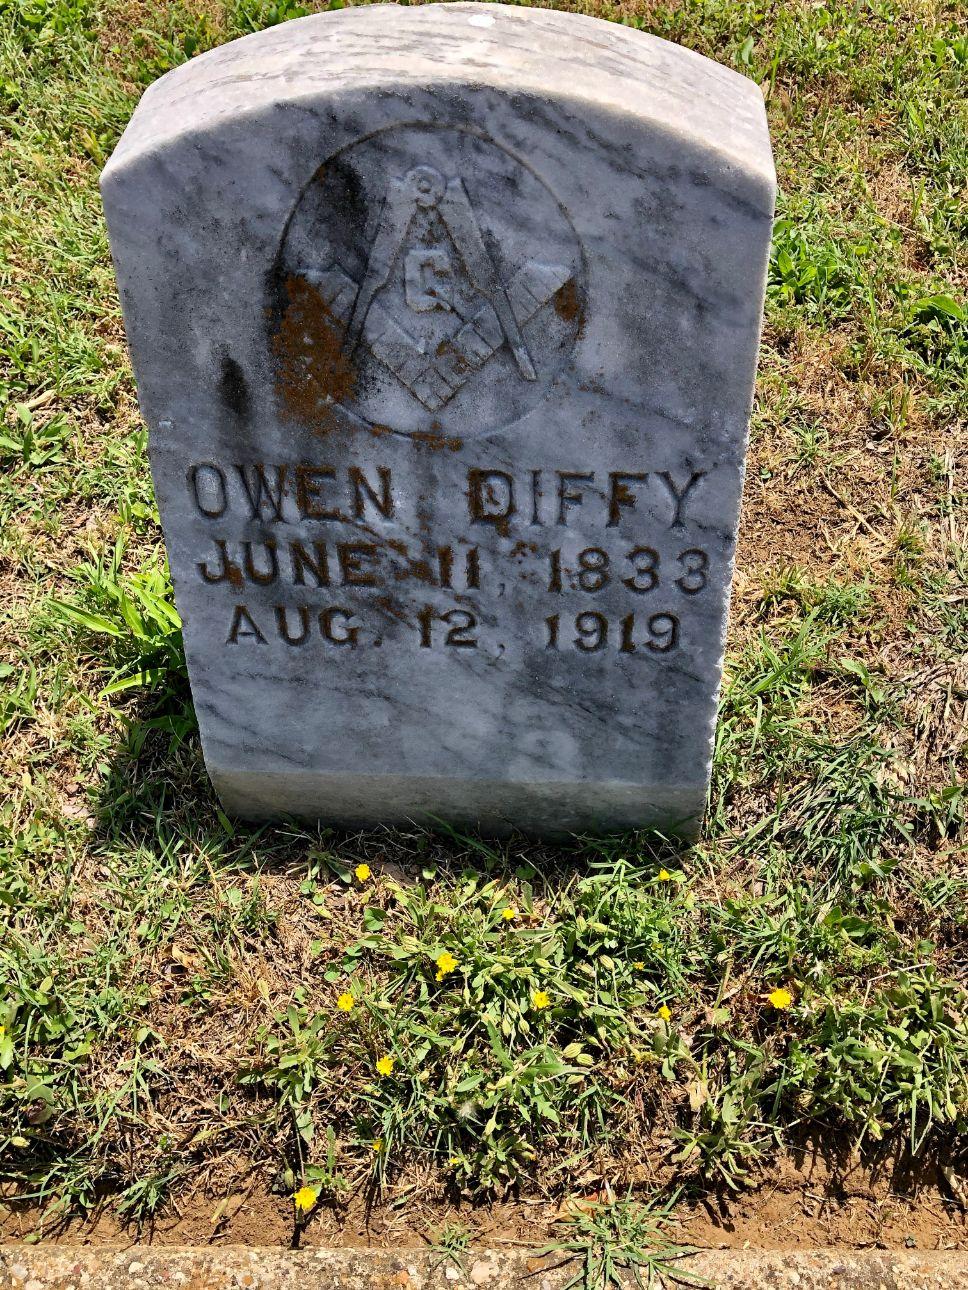 Diffy